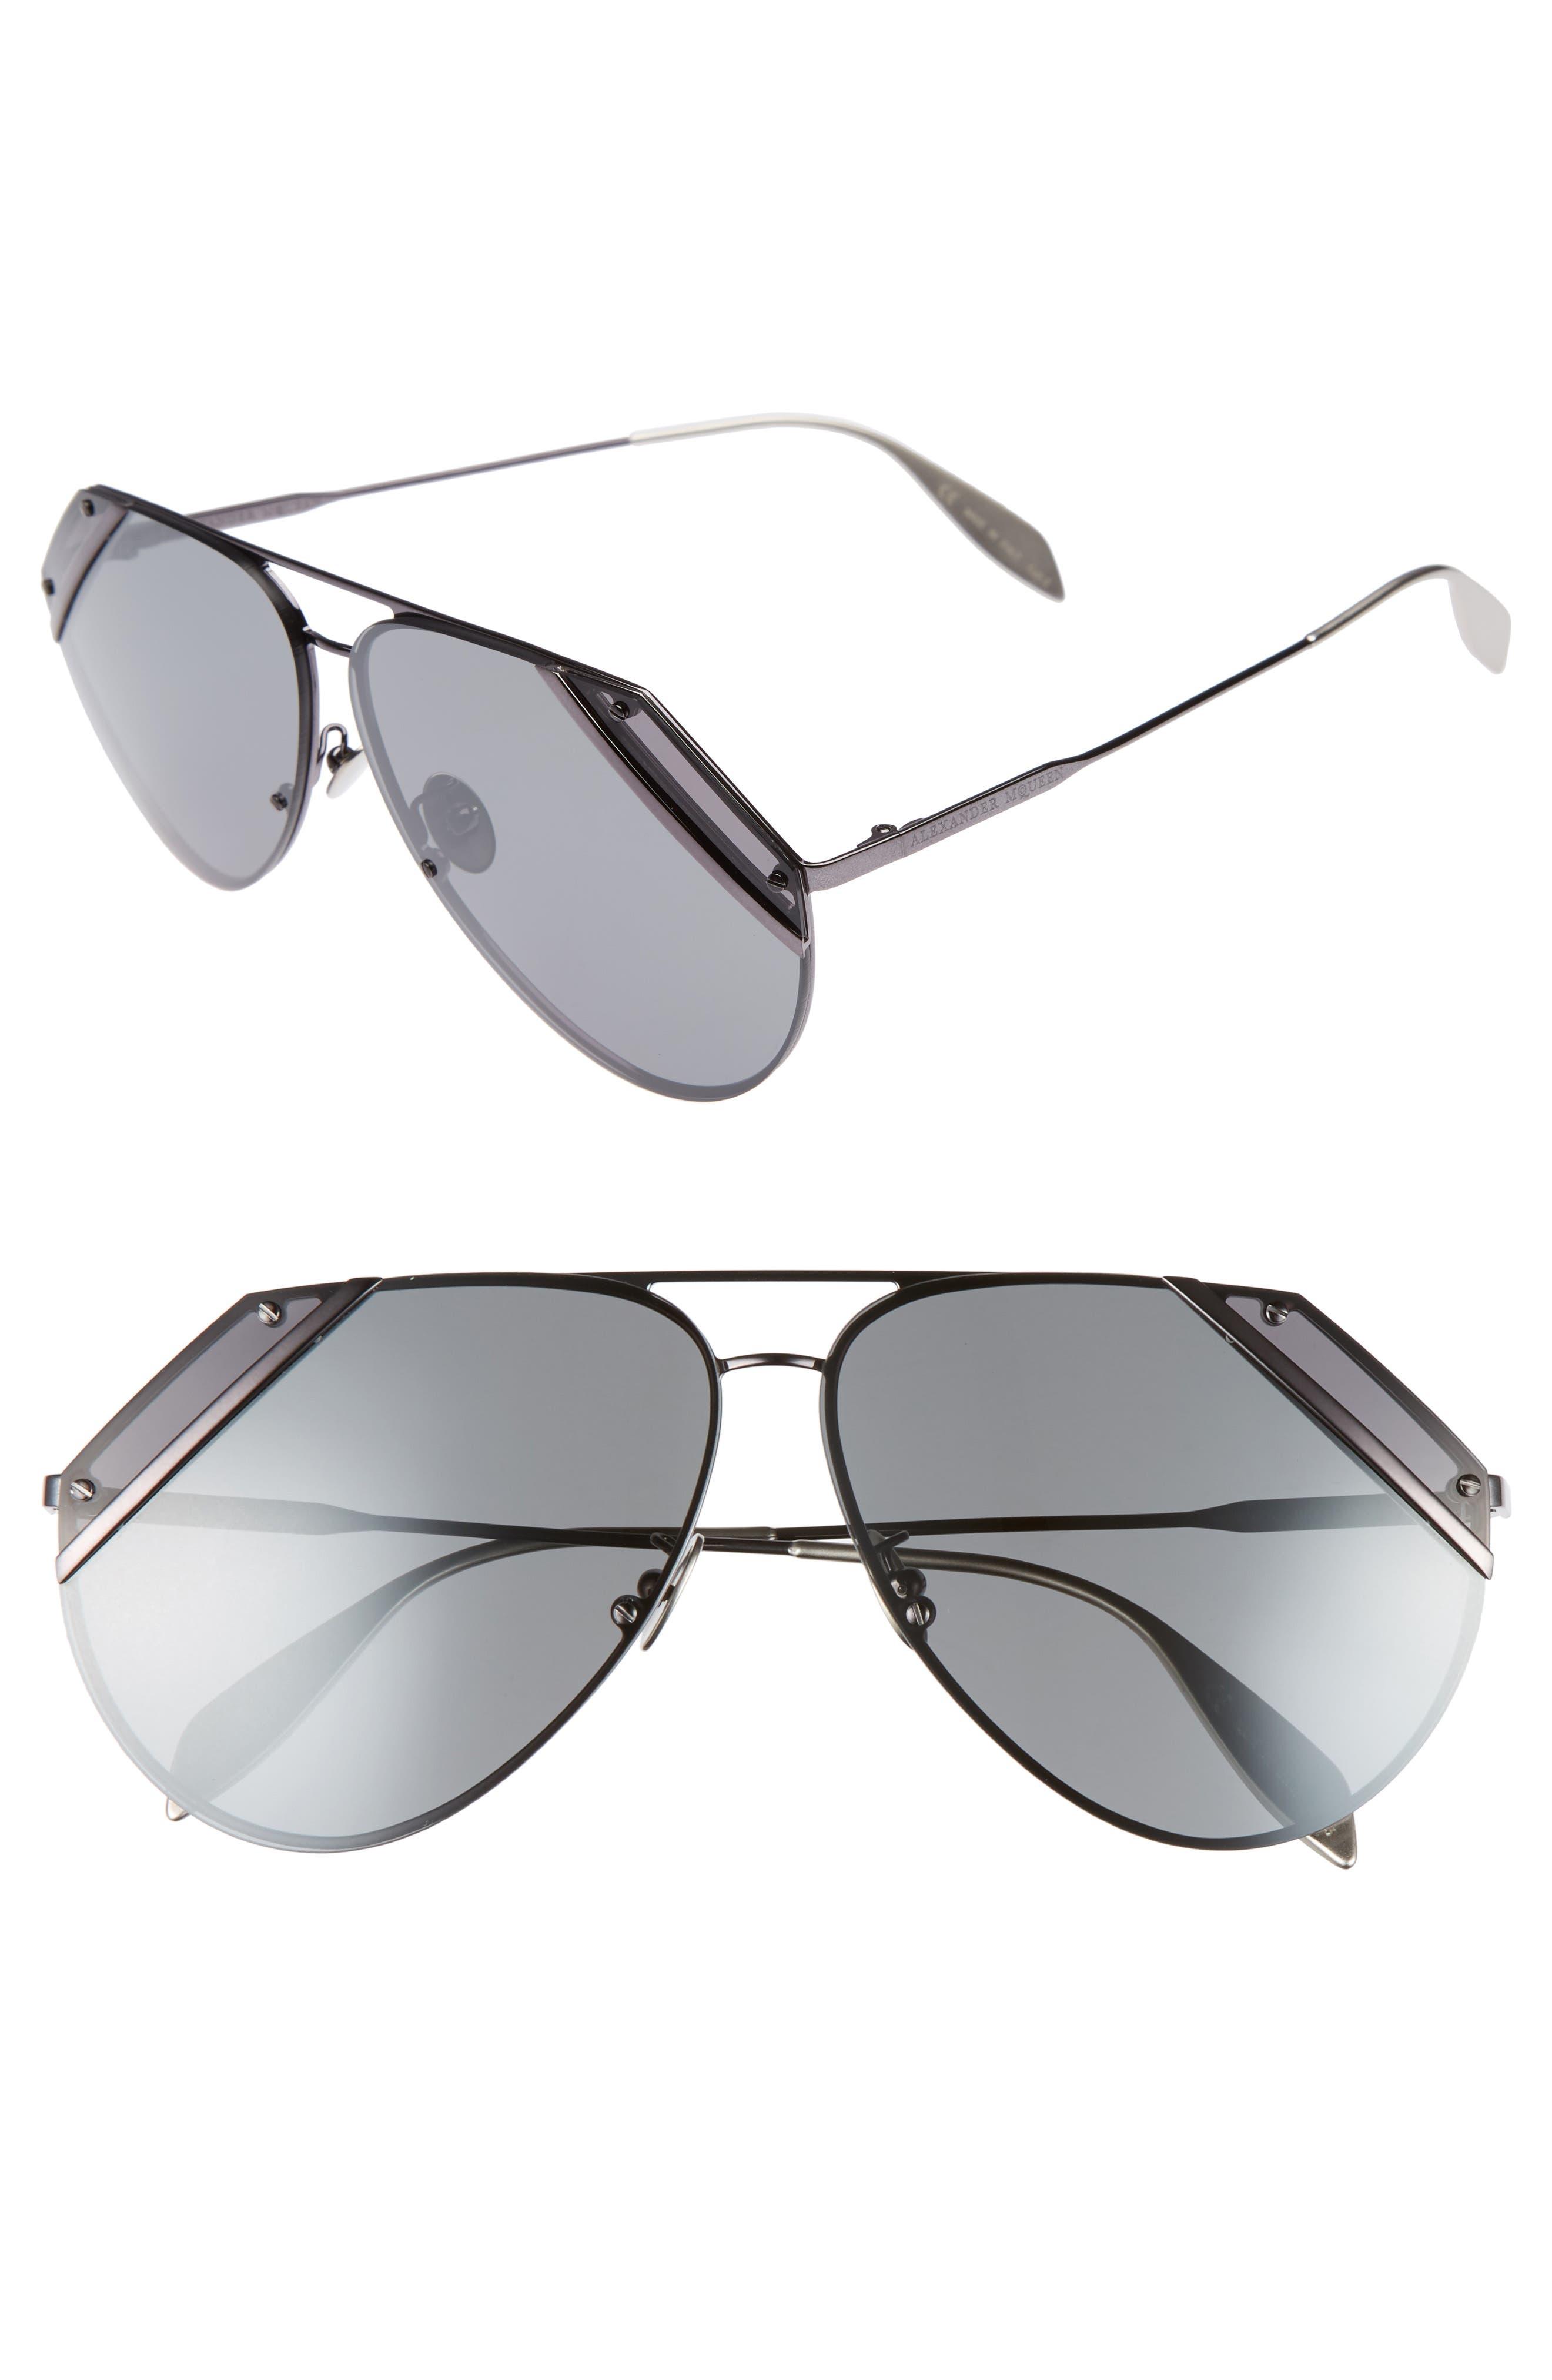 65mm Snip Frame Aviator Sunglasses,                             Main thumbnail 2, color,